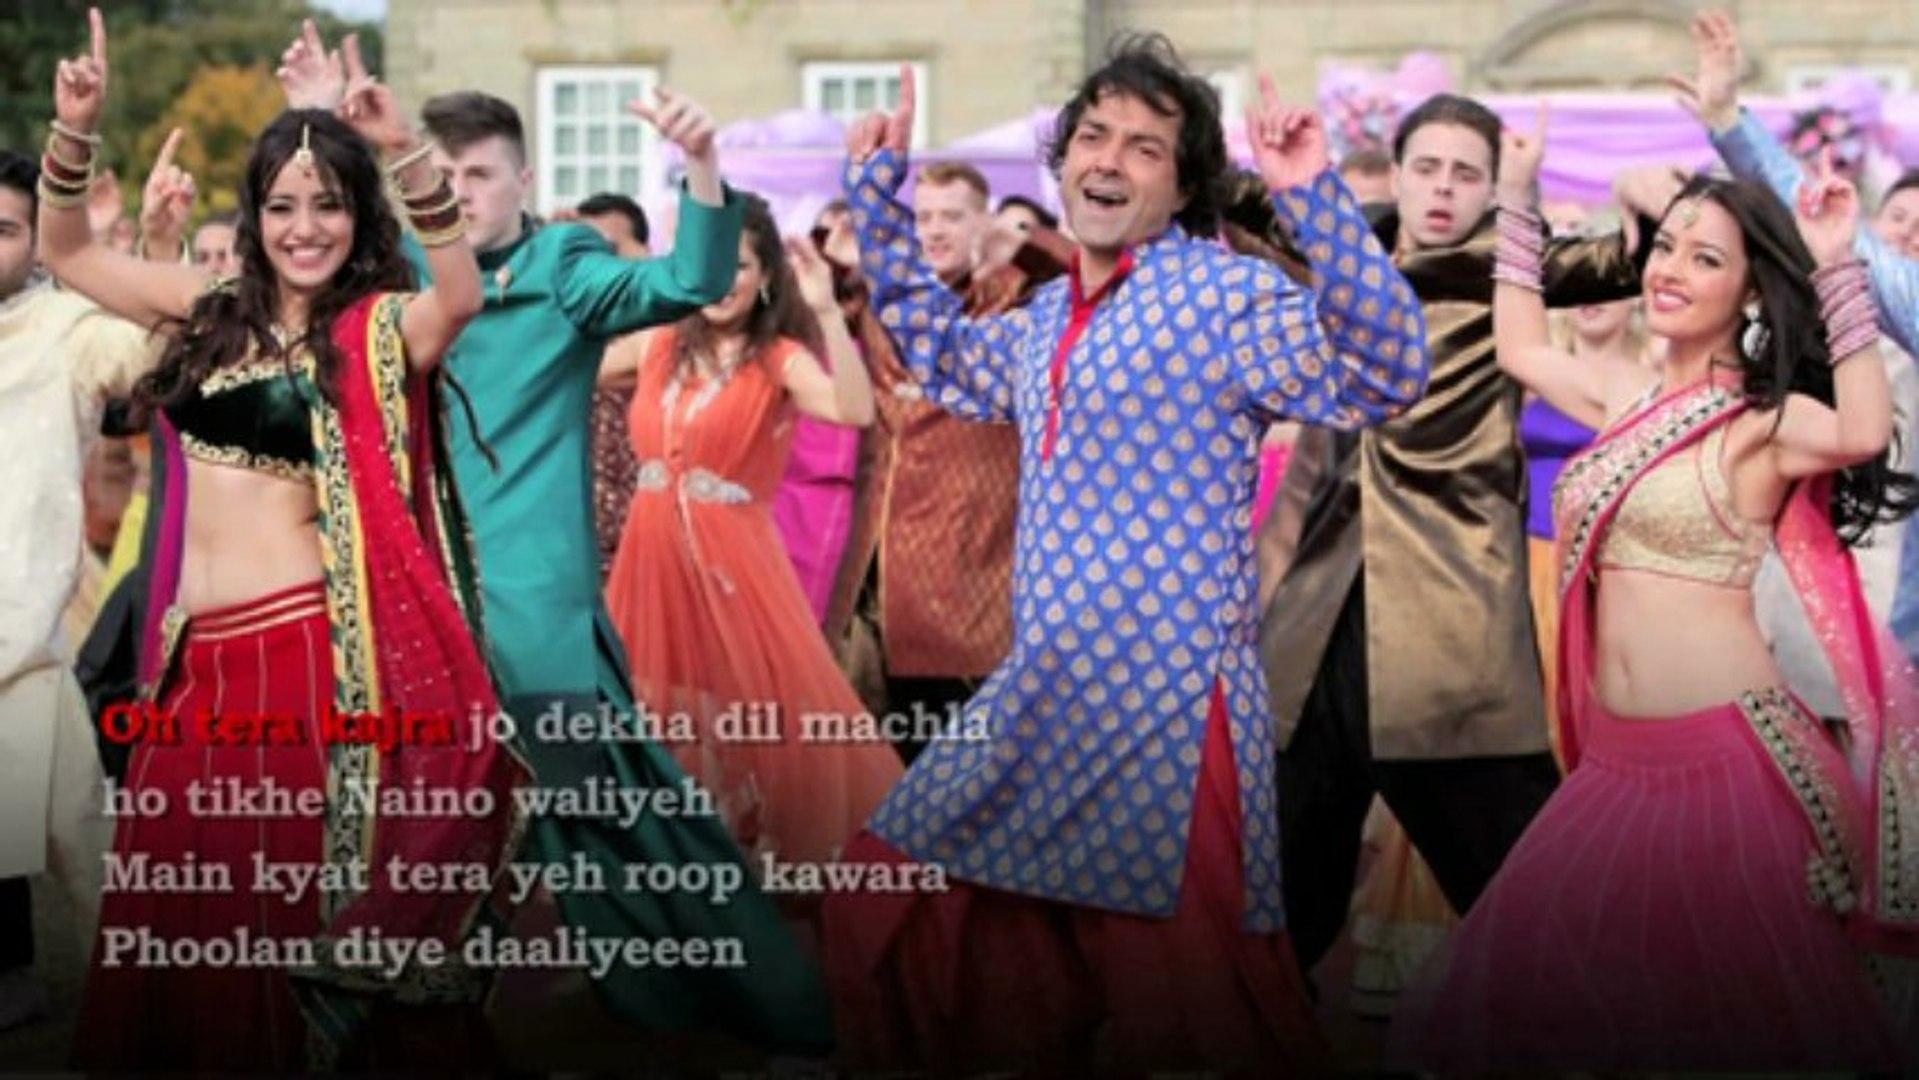 Suit Tera Laal Full Song with Lyrics - Yamla Pagla Deewana 2; Sunny Deol, Bobby Deol